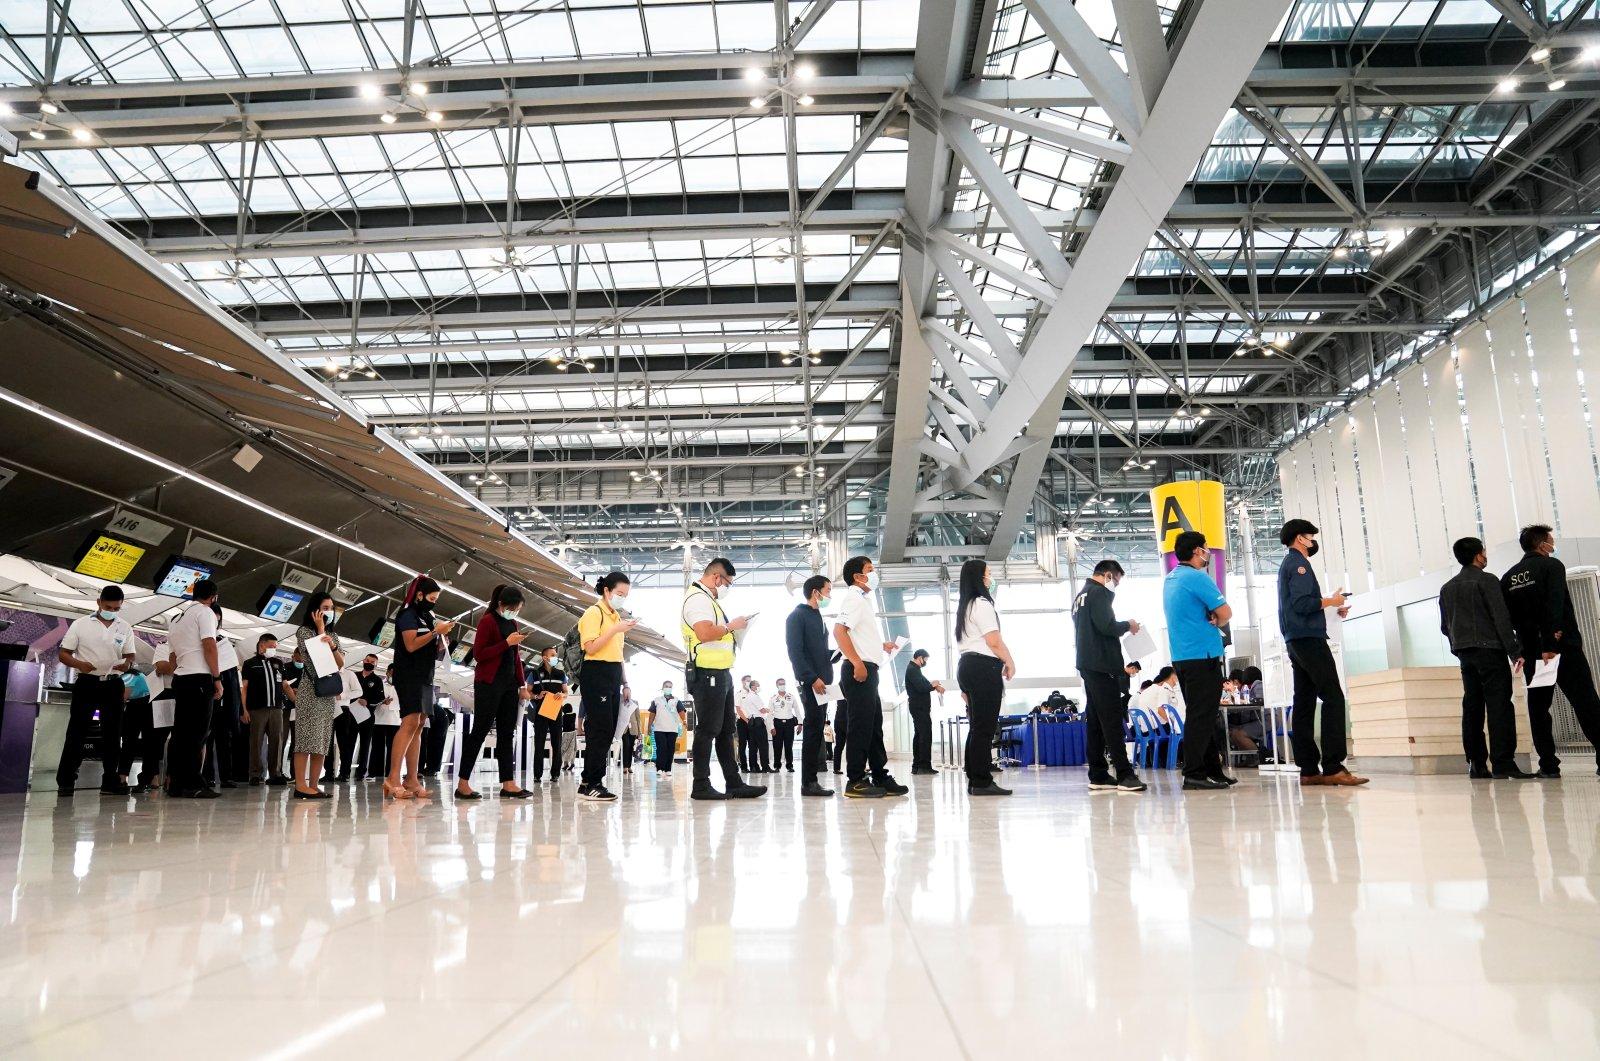 Airport staff line up to receive China's Sinovac COVID-19 vaccine at Suvarnabhumi Airport, Bangkok, Thailand, April 5, 2021. (Reuters Photo)